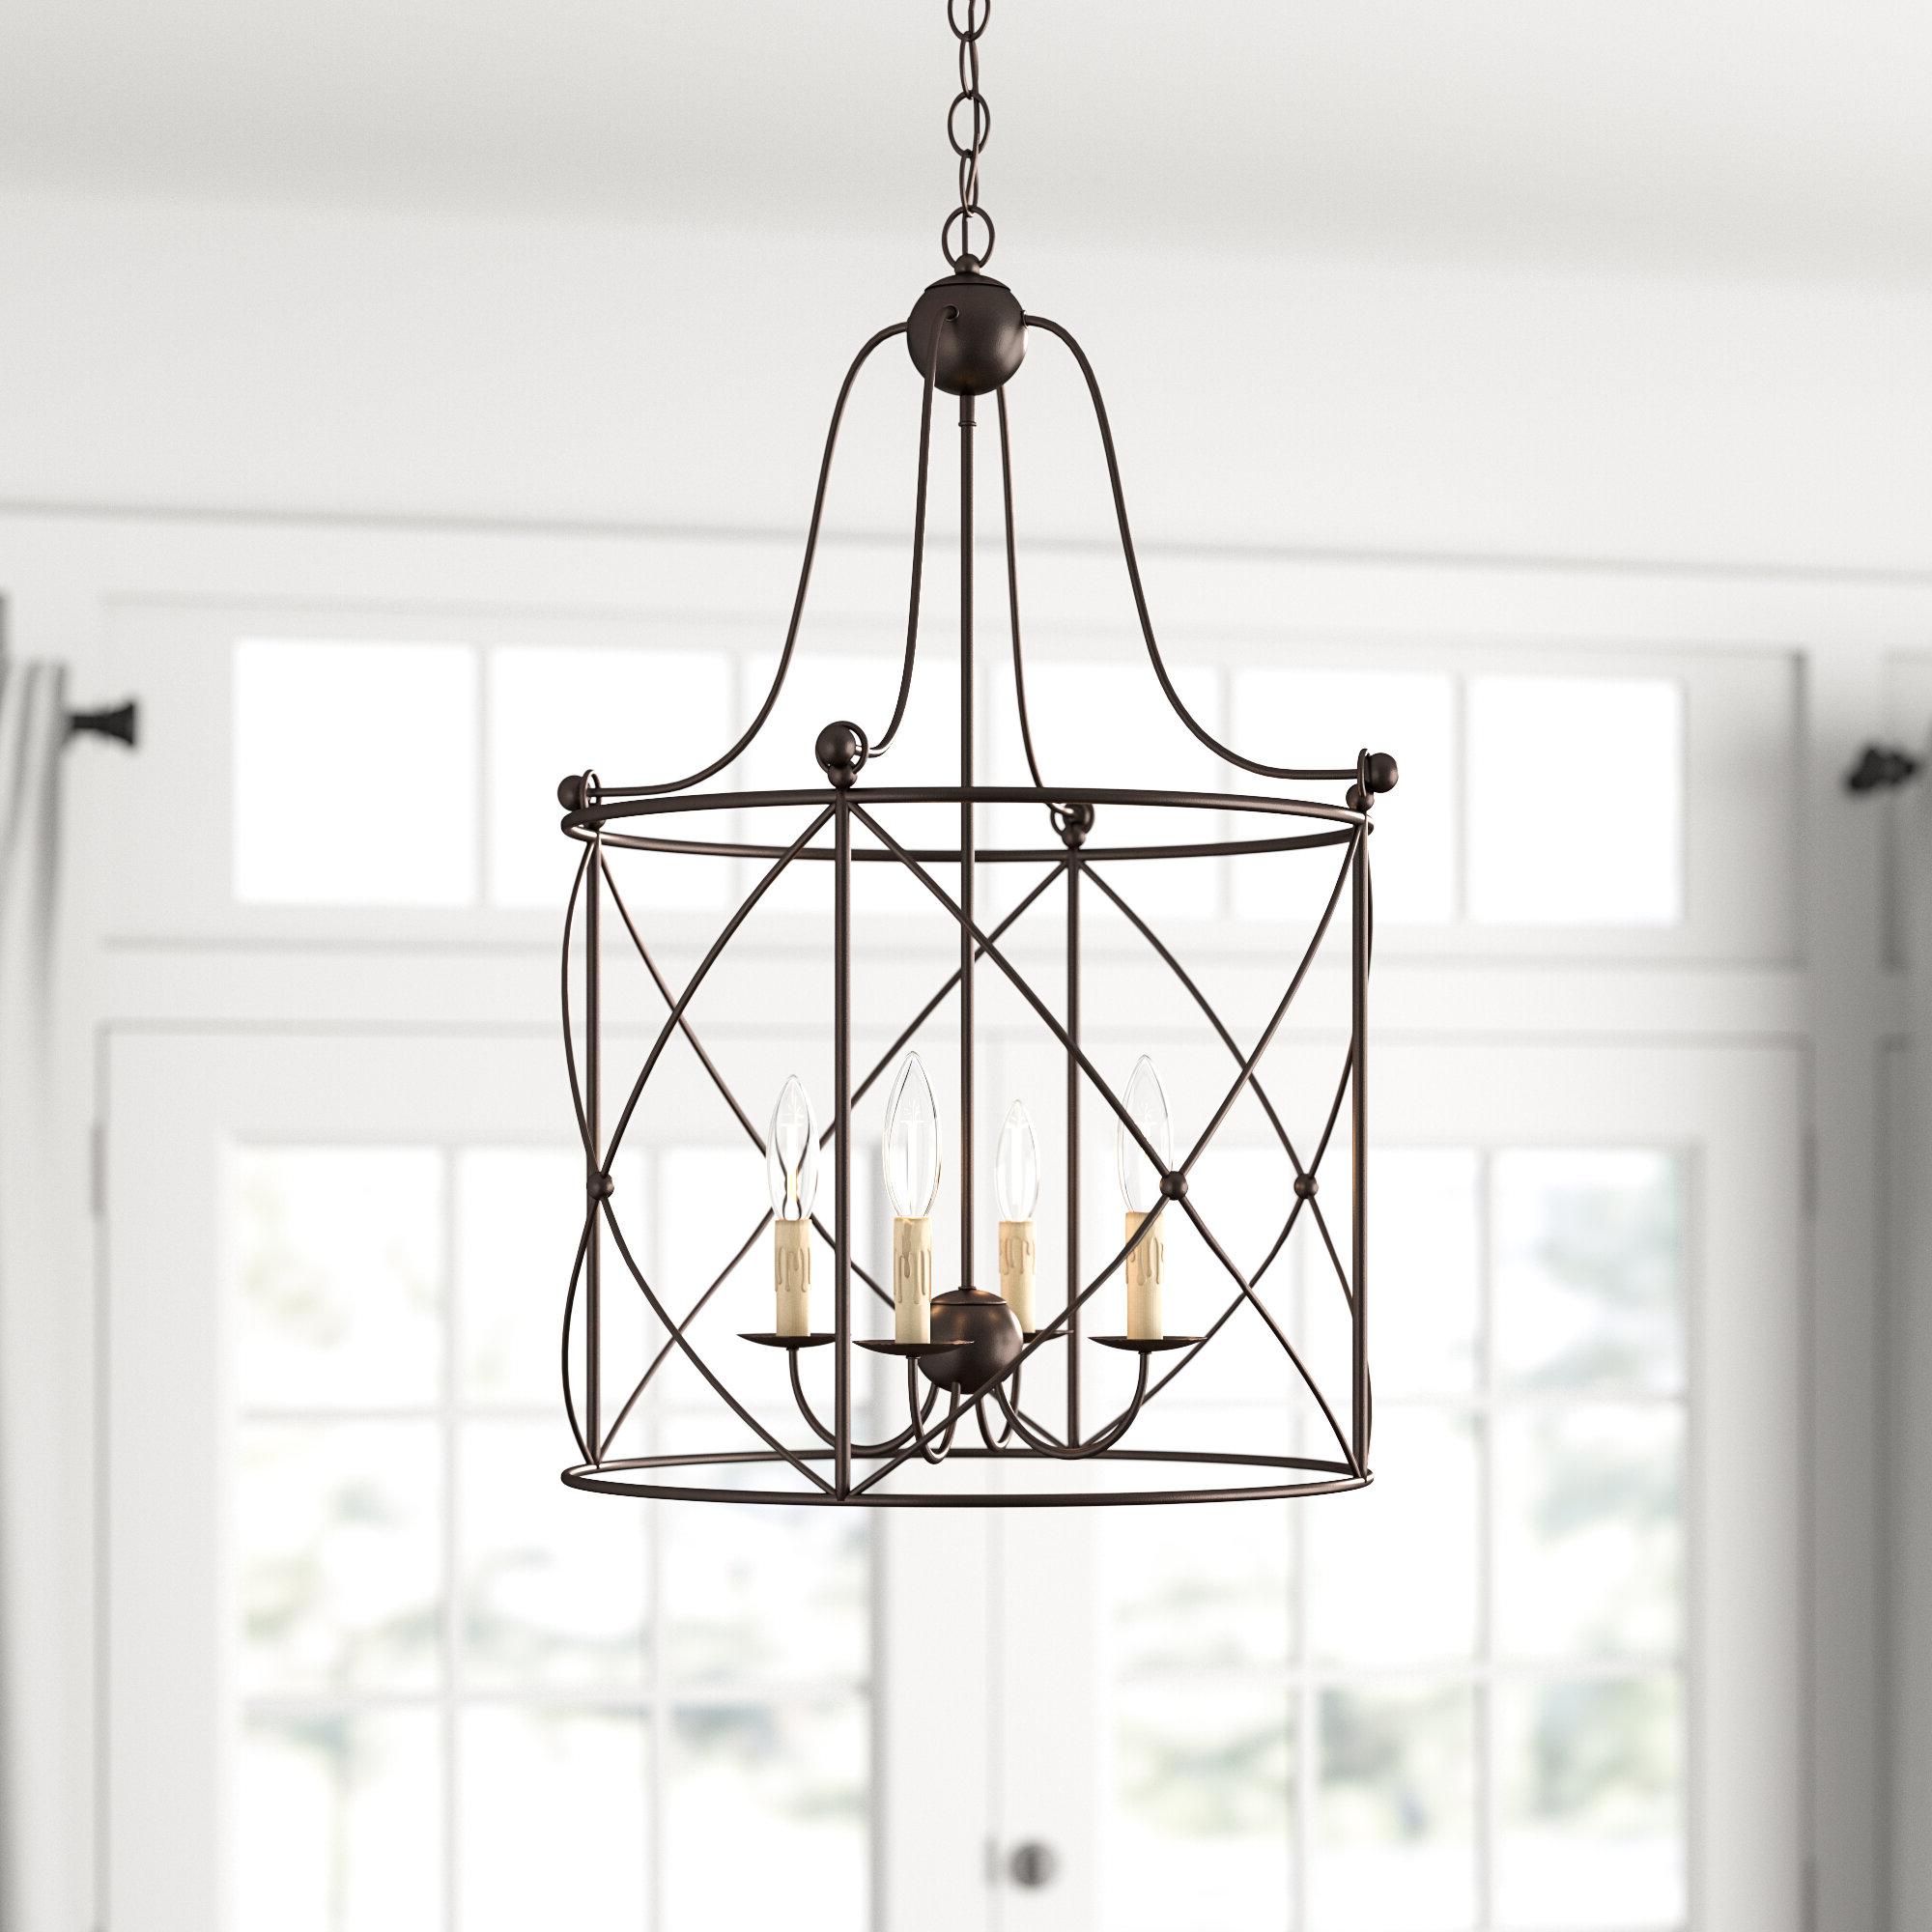 Widely Used Gracie Oaks Aniyah 4 Light Lantern Geometric Pendant Regarding Freeburg 4 Light Lantern Square / Rectangle Pendants (View 15 of 25)